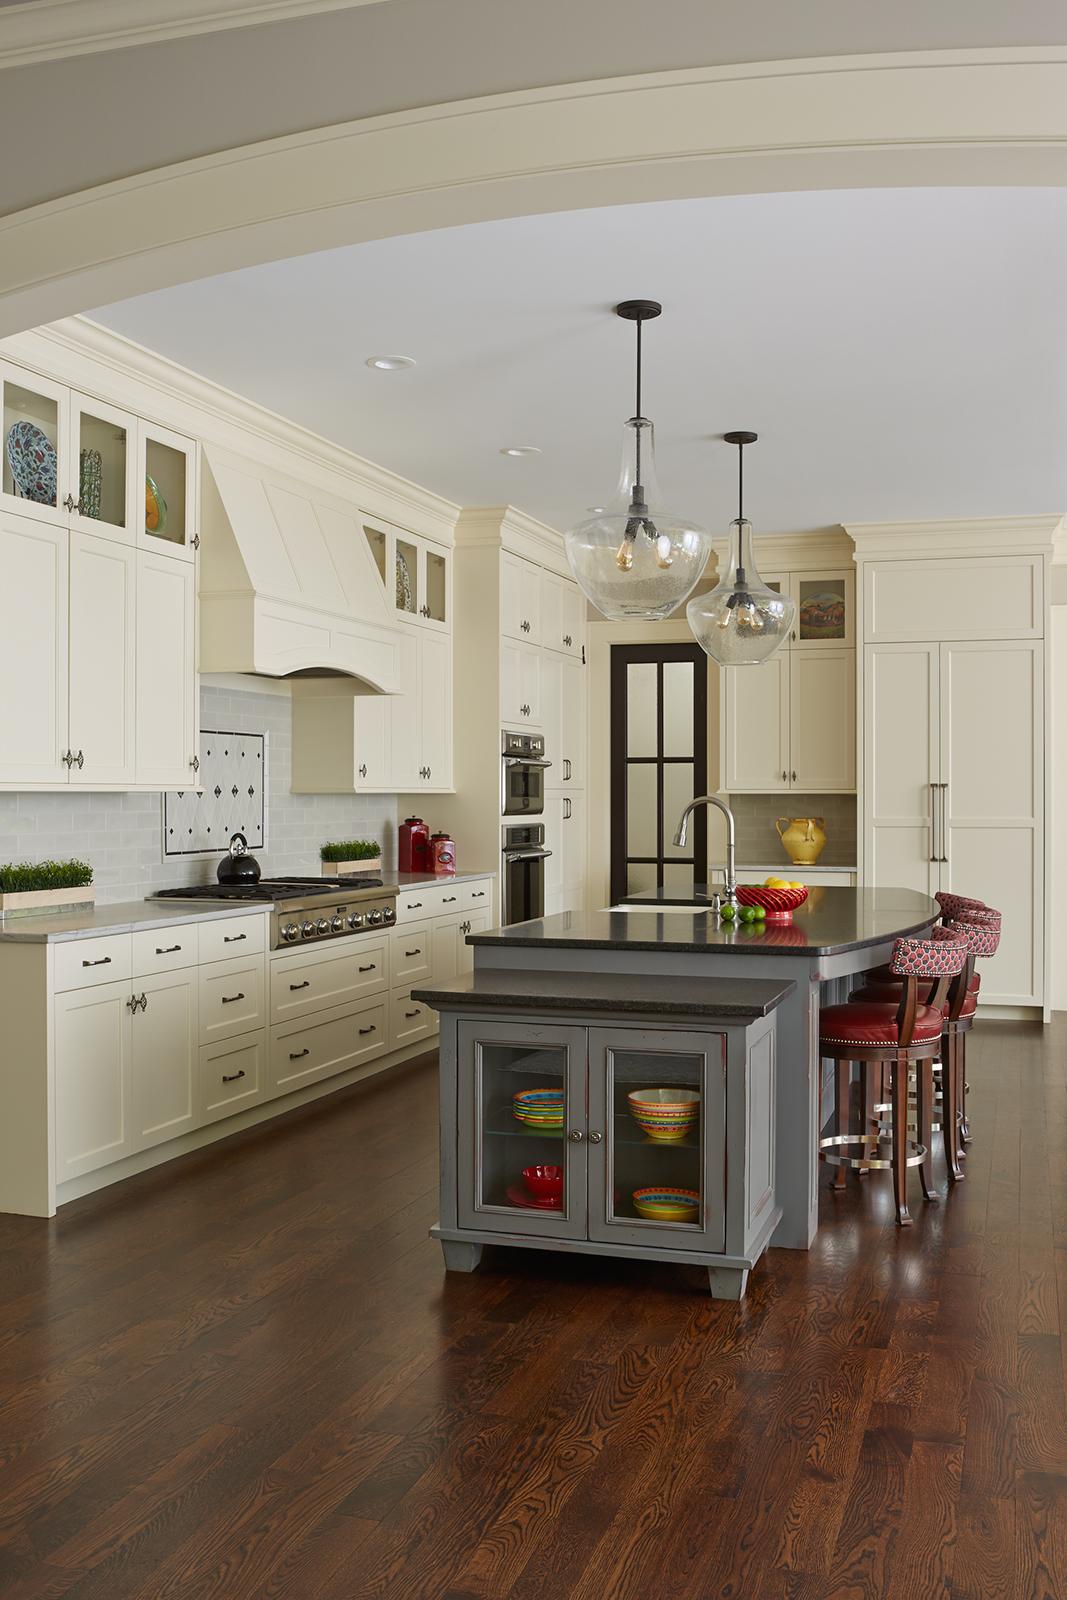 Edina_creekside_kitchen-v3_lrg.jpg